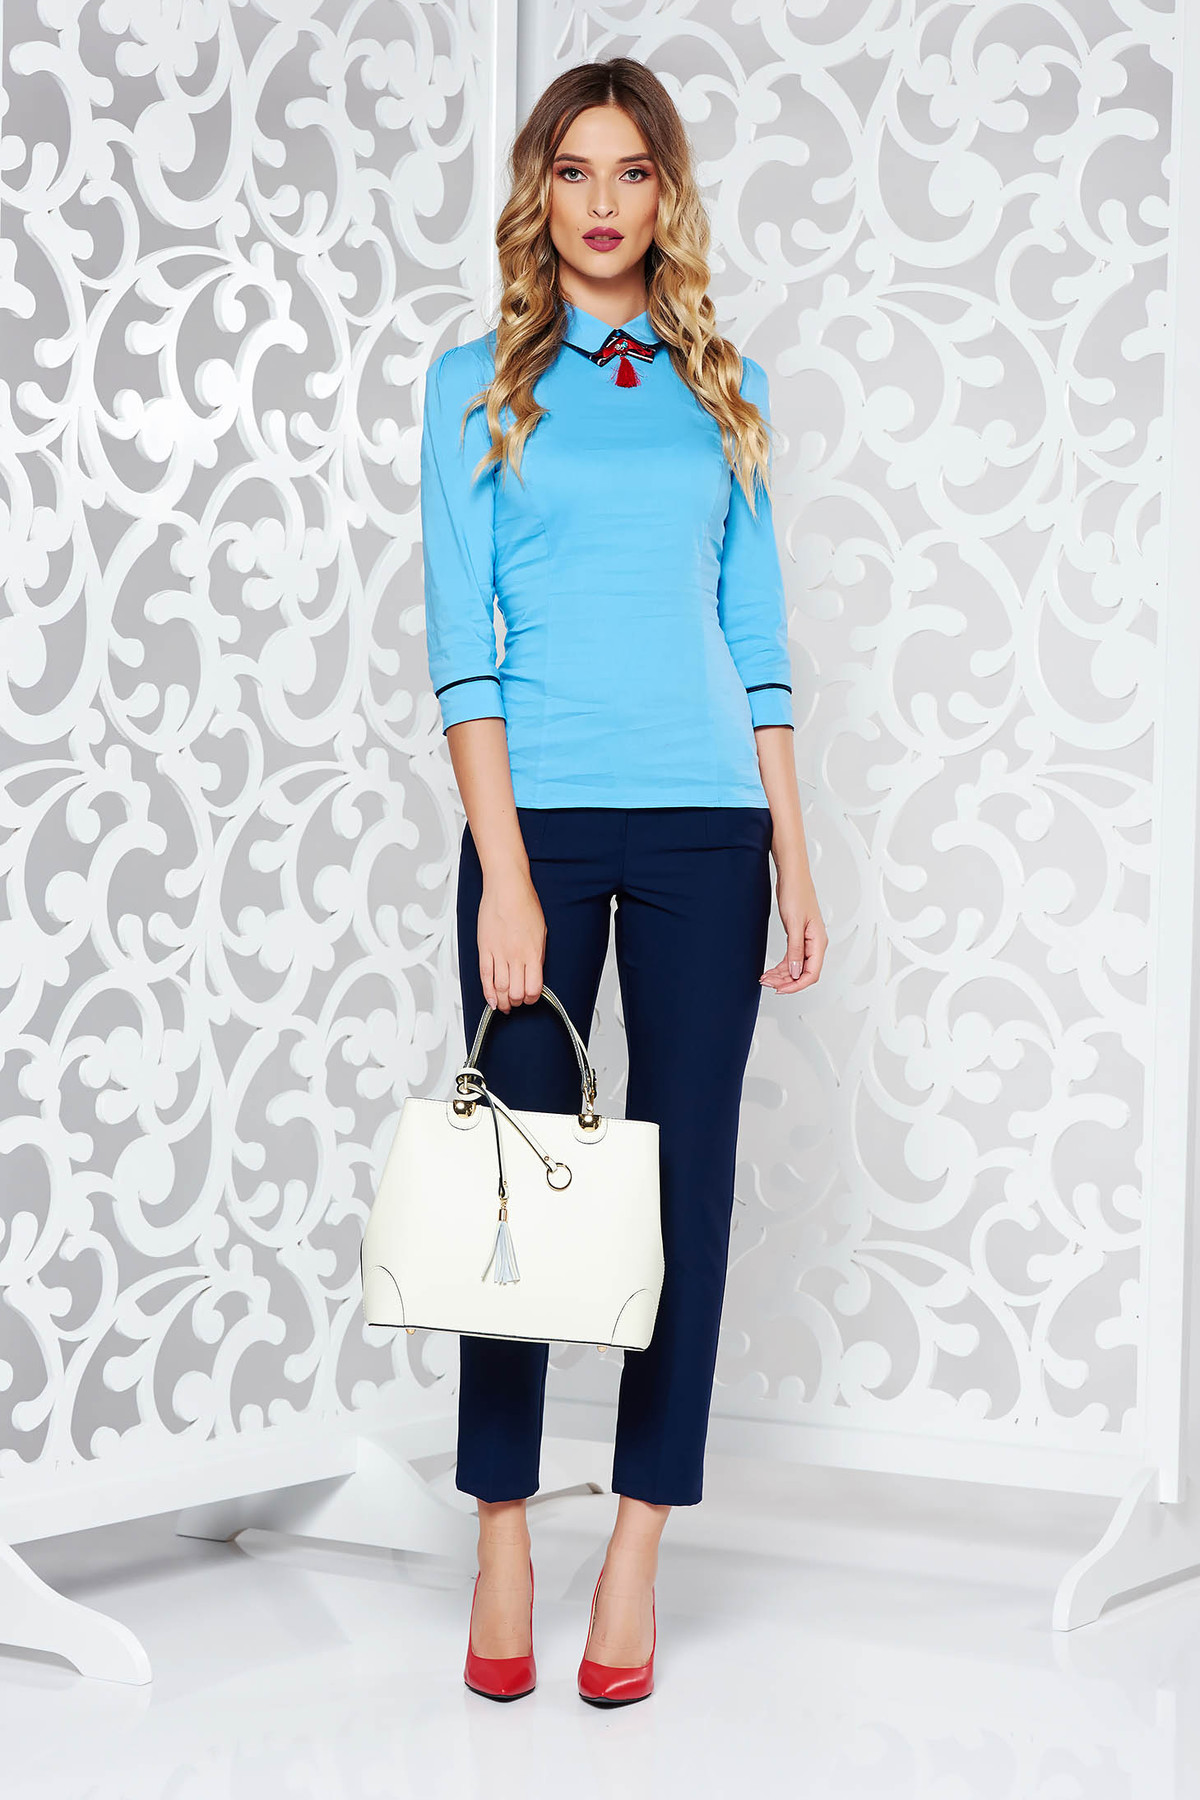 Camasa dama Fofy albastra office din bumbac cu un croi mulat accesorizata cu brosa